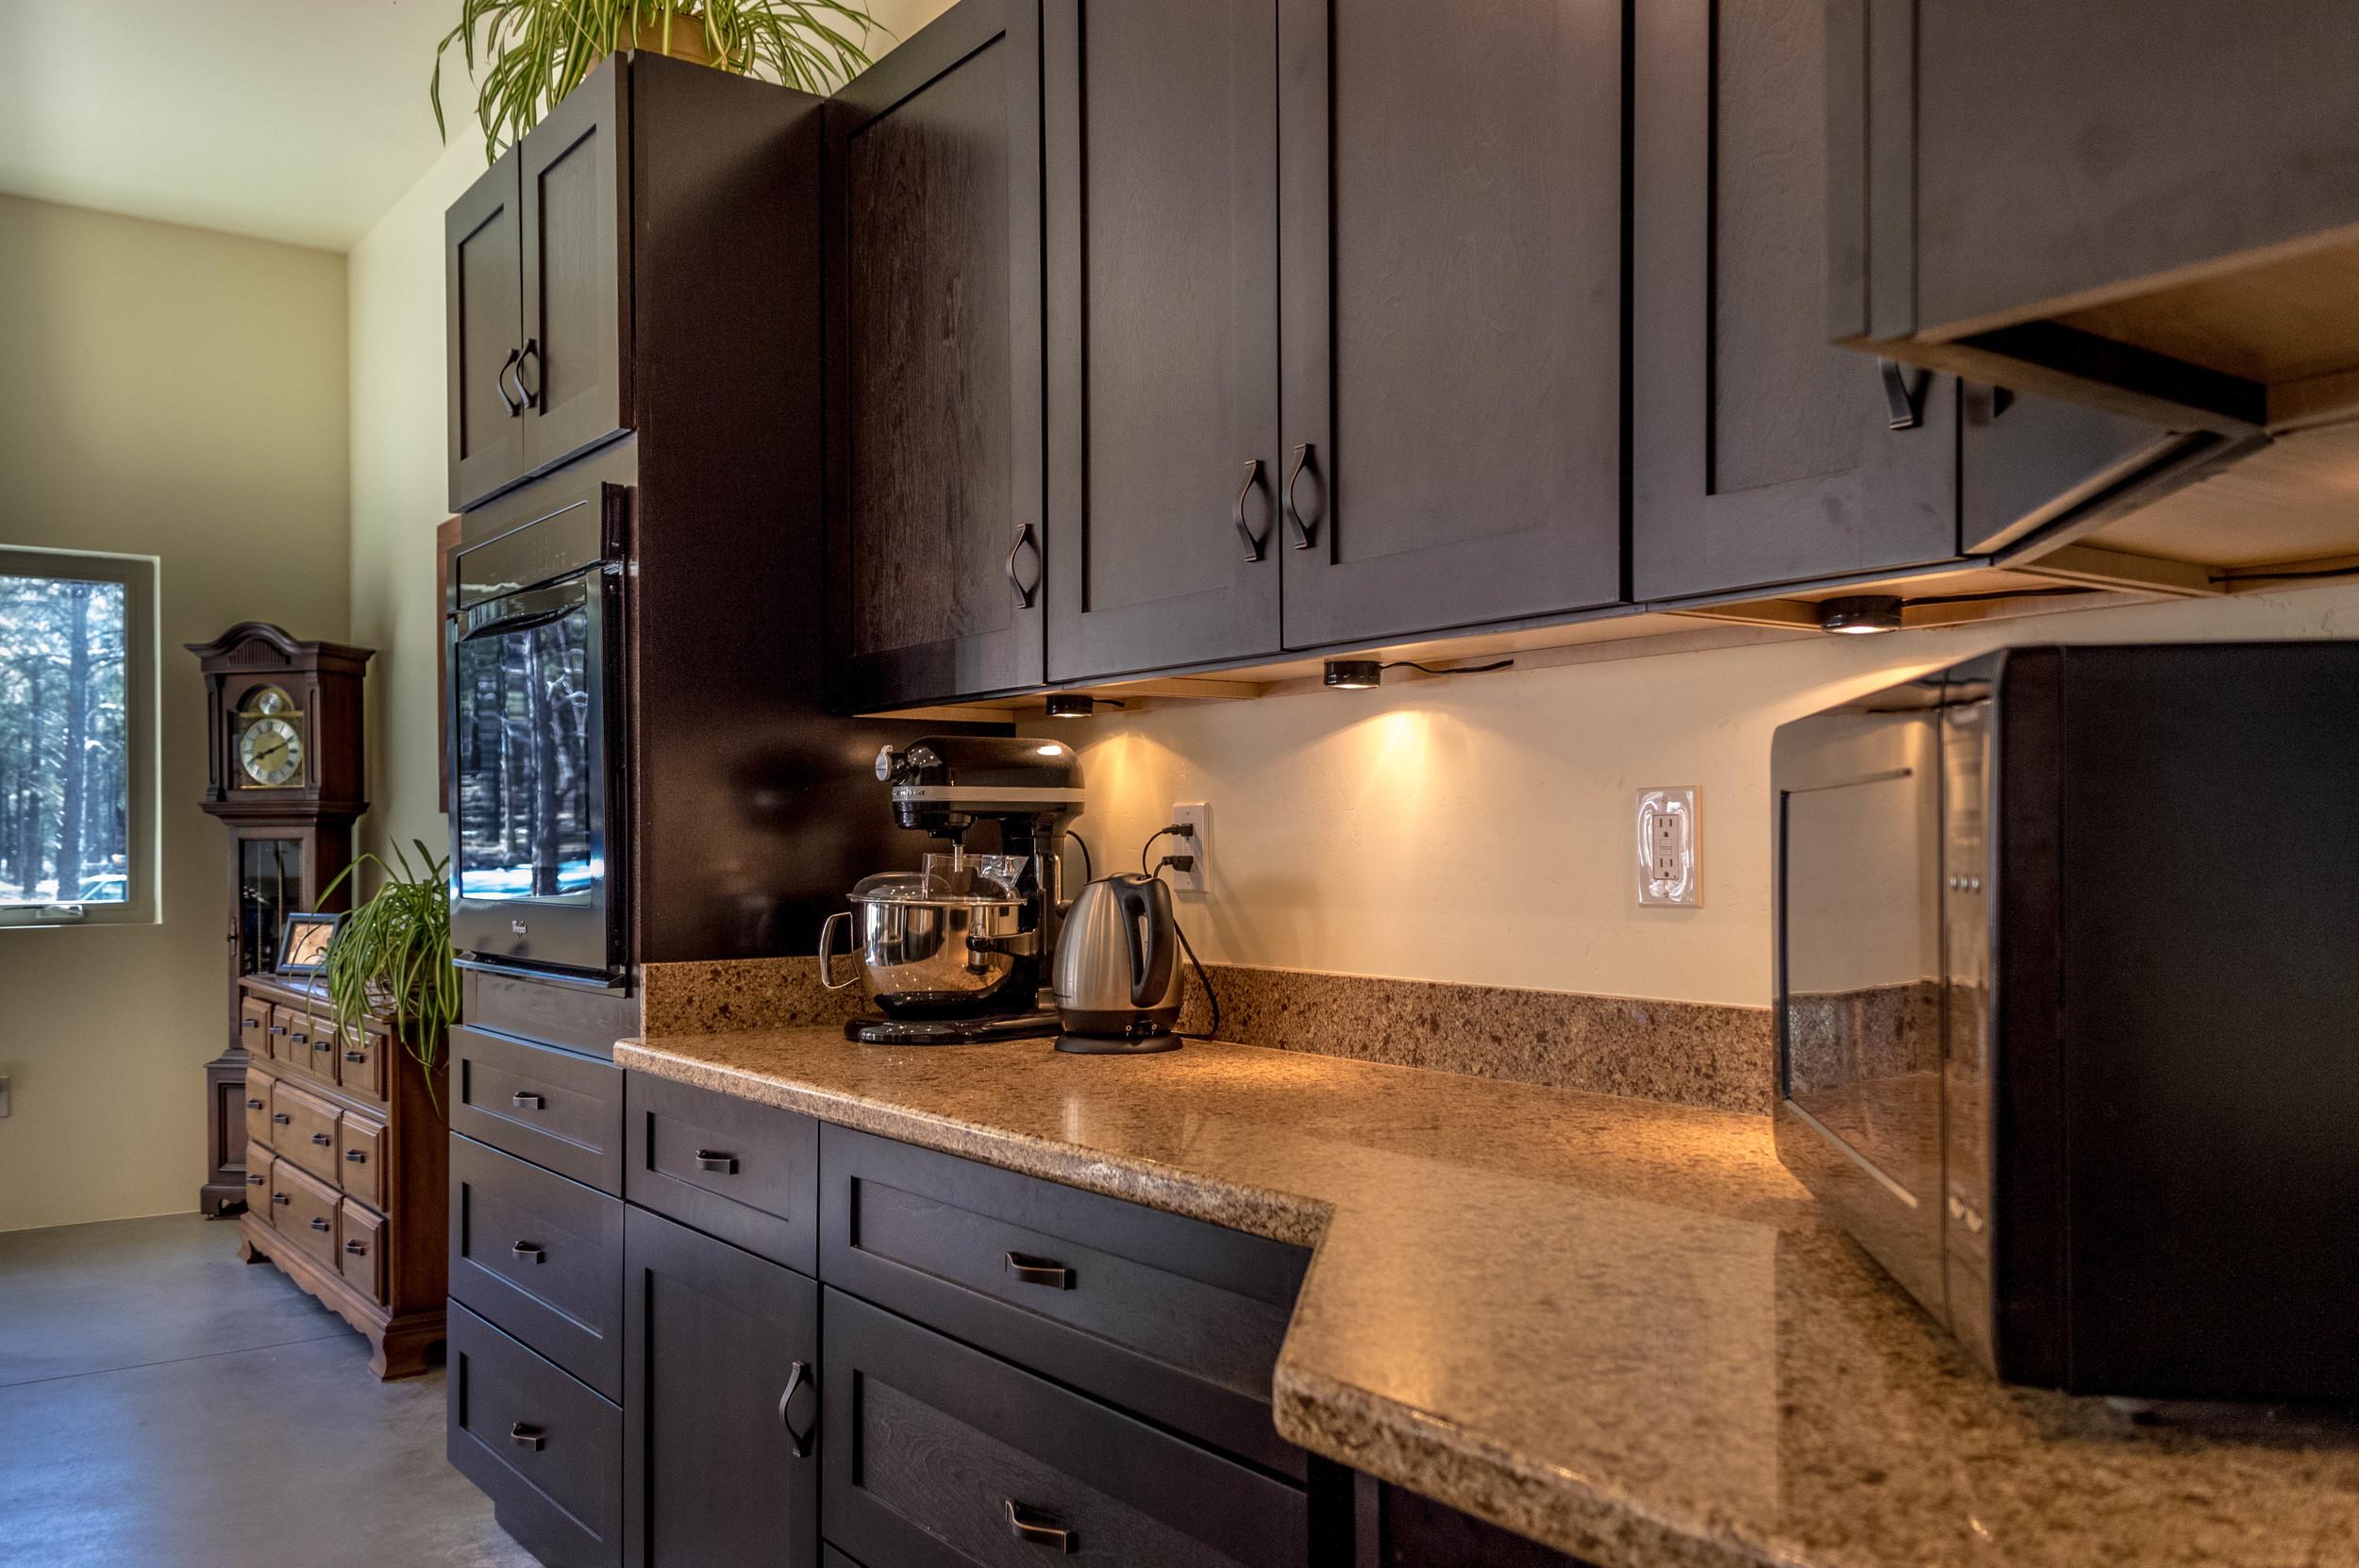 Custom kitchen in a residential home near Flagstaff, Arizona.